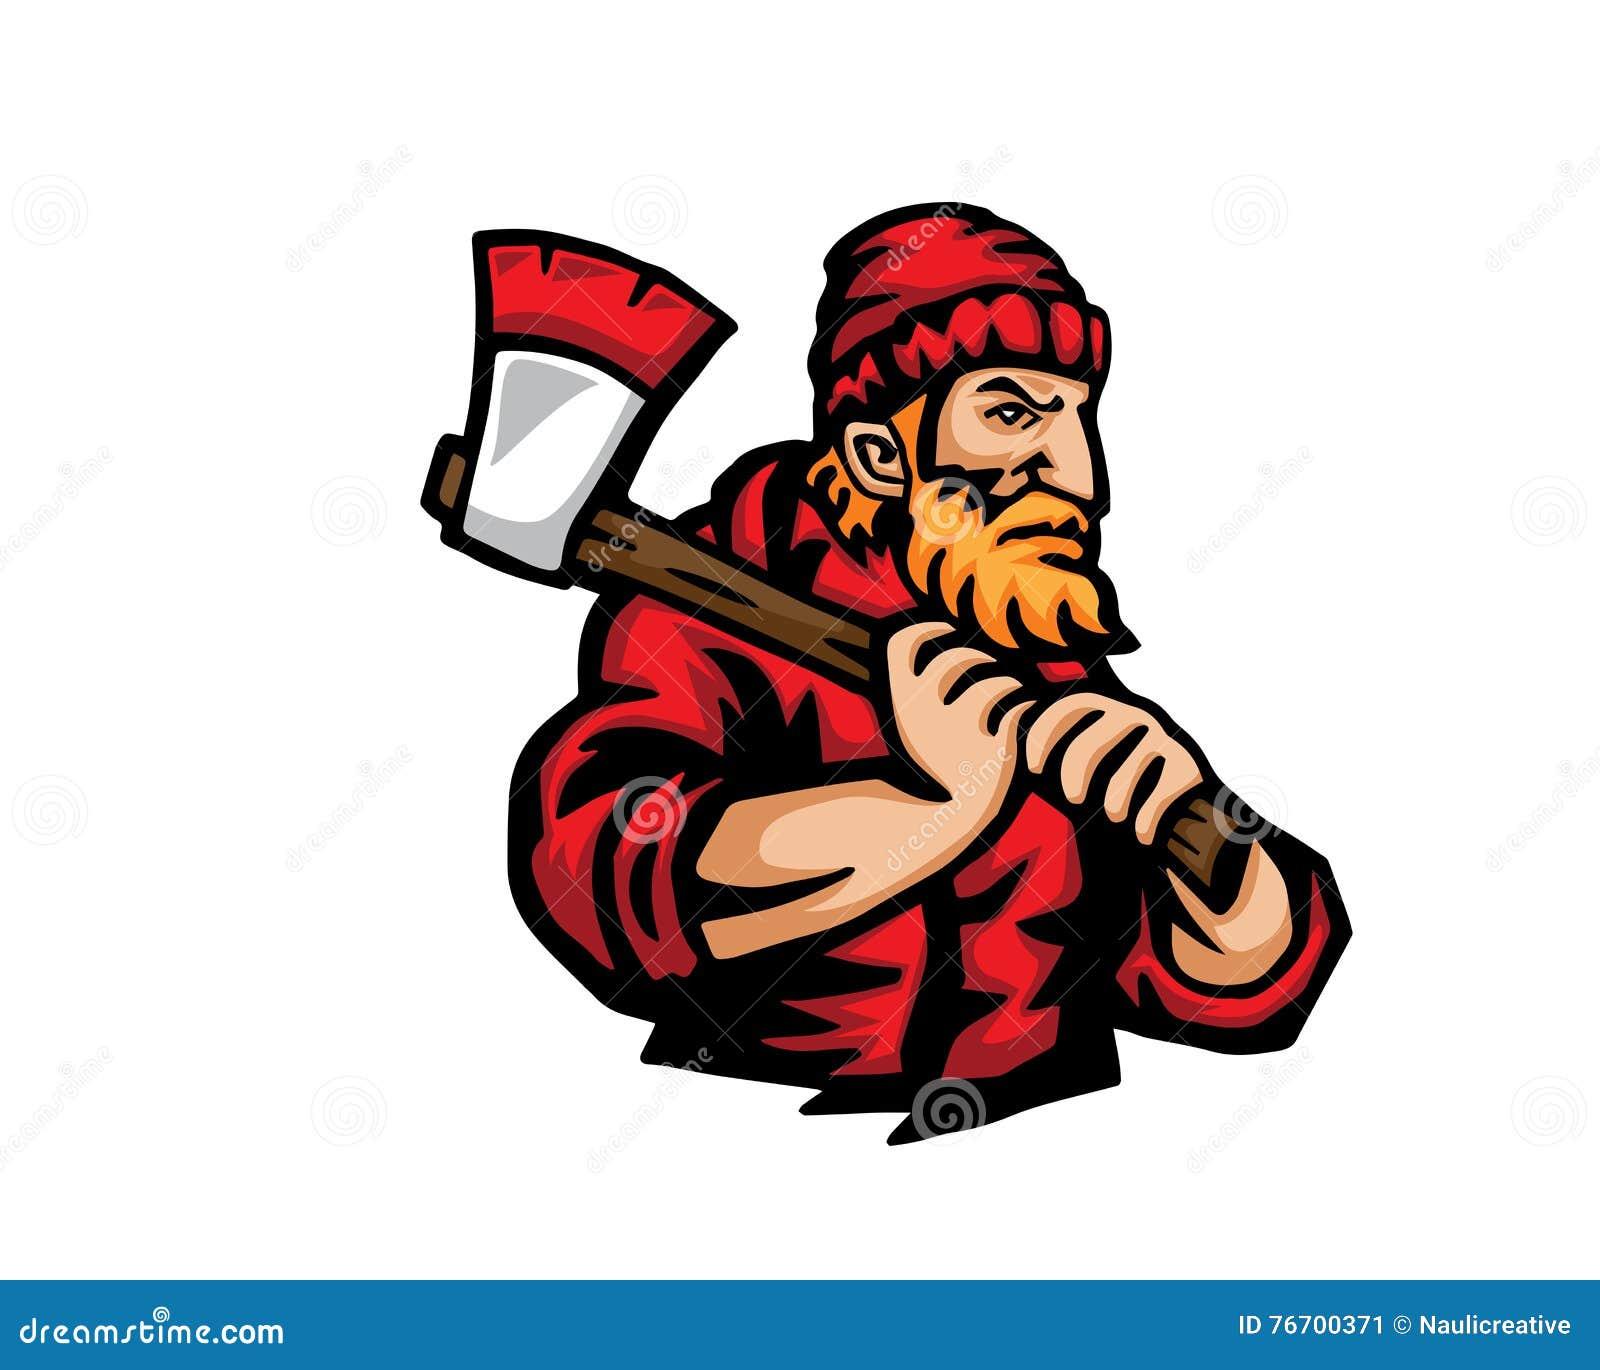 Modern Occupation People Cartoon Logo - Lumberjack